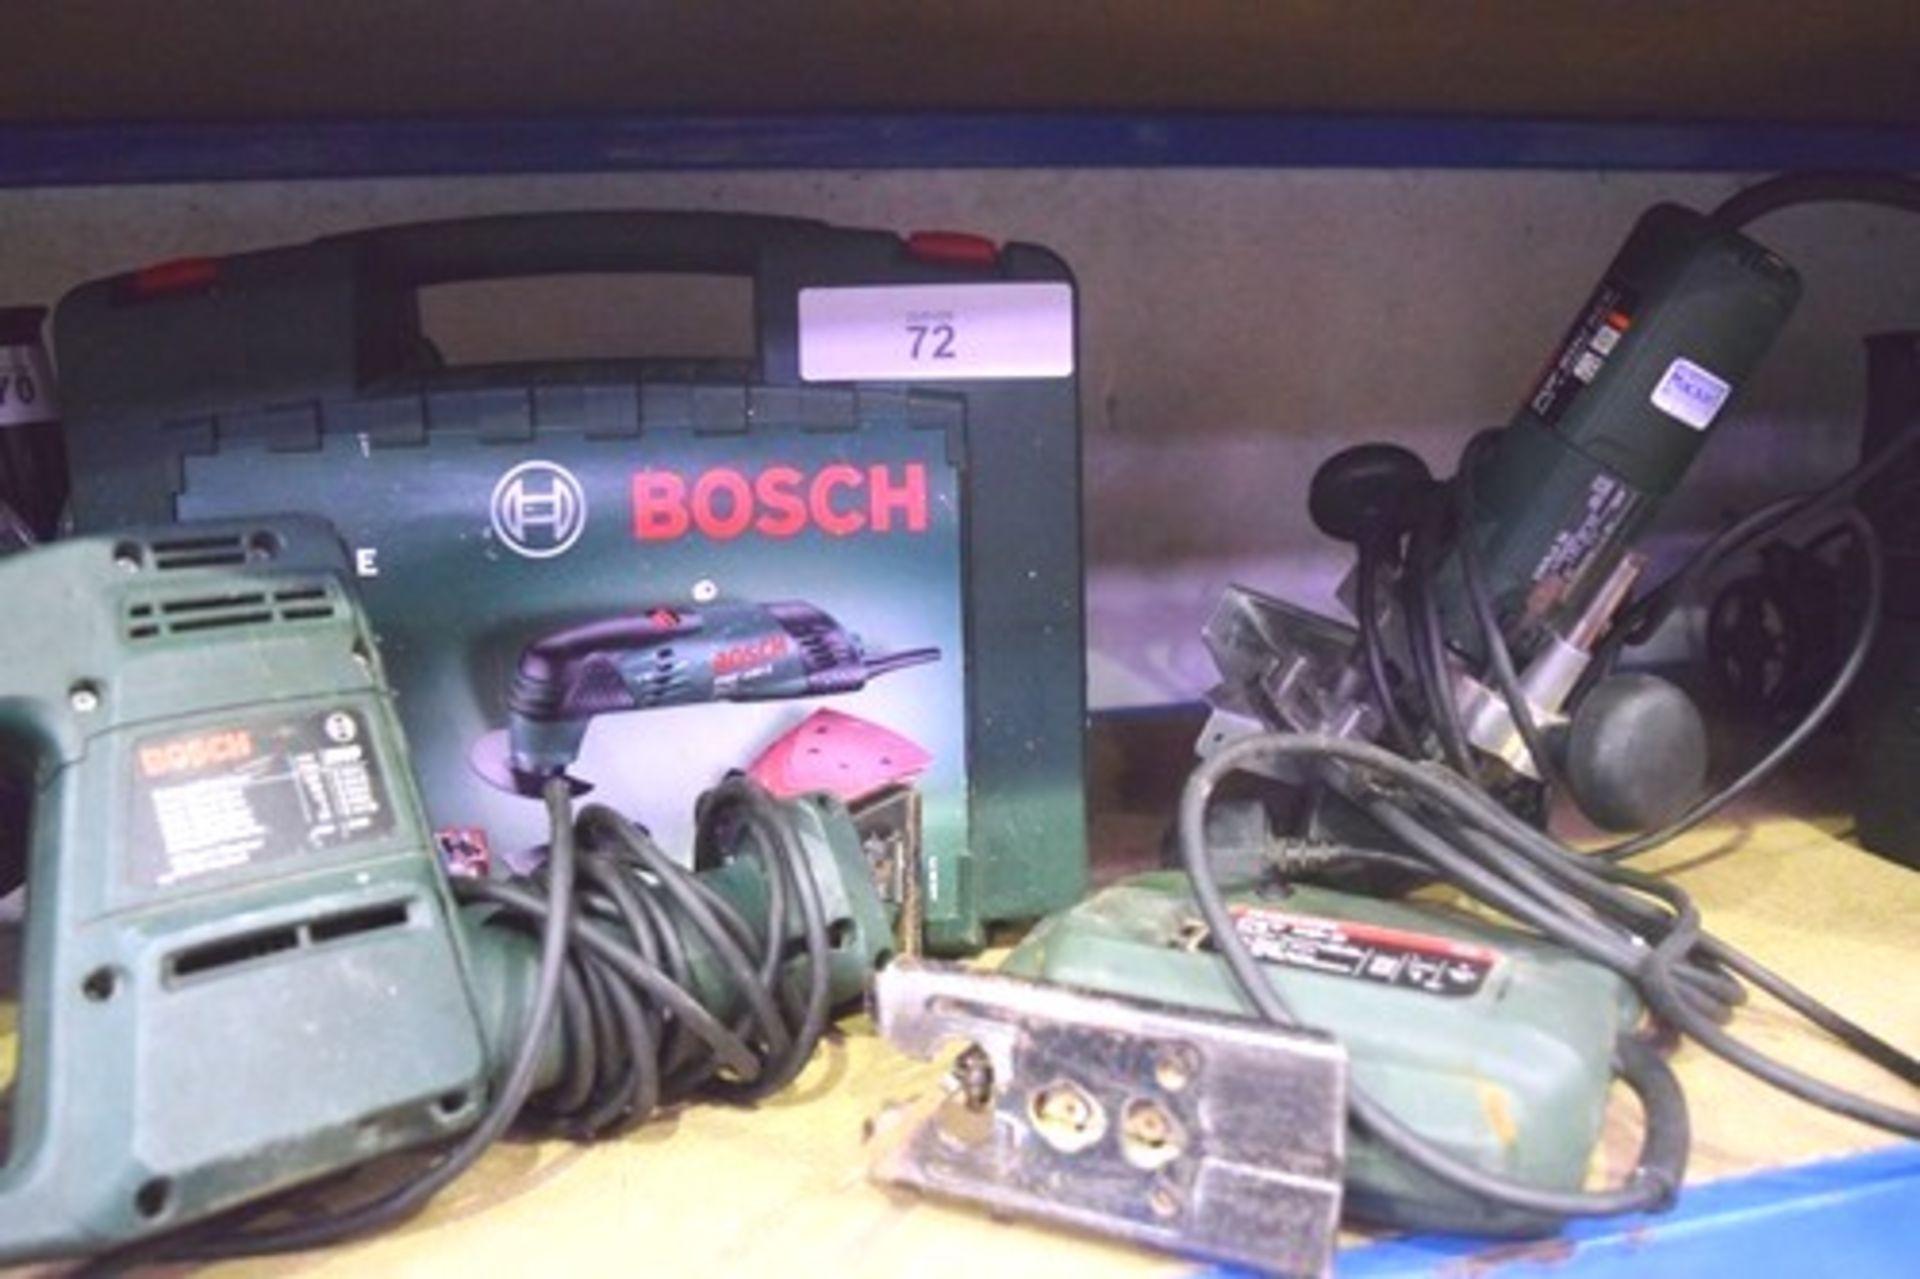 Lot 72 - 4 x Bosch 240V hand tools comprising 1 x reciprocating saw, model PFZ550, 1 x PMF180E multi, 1 x